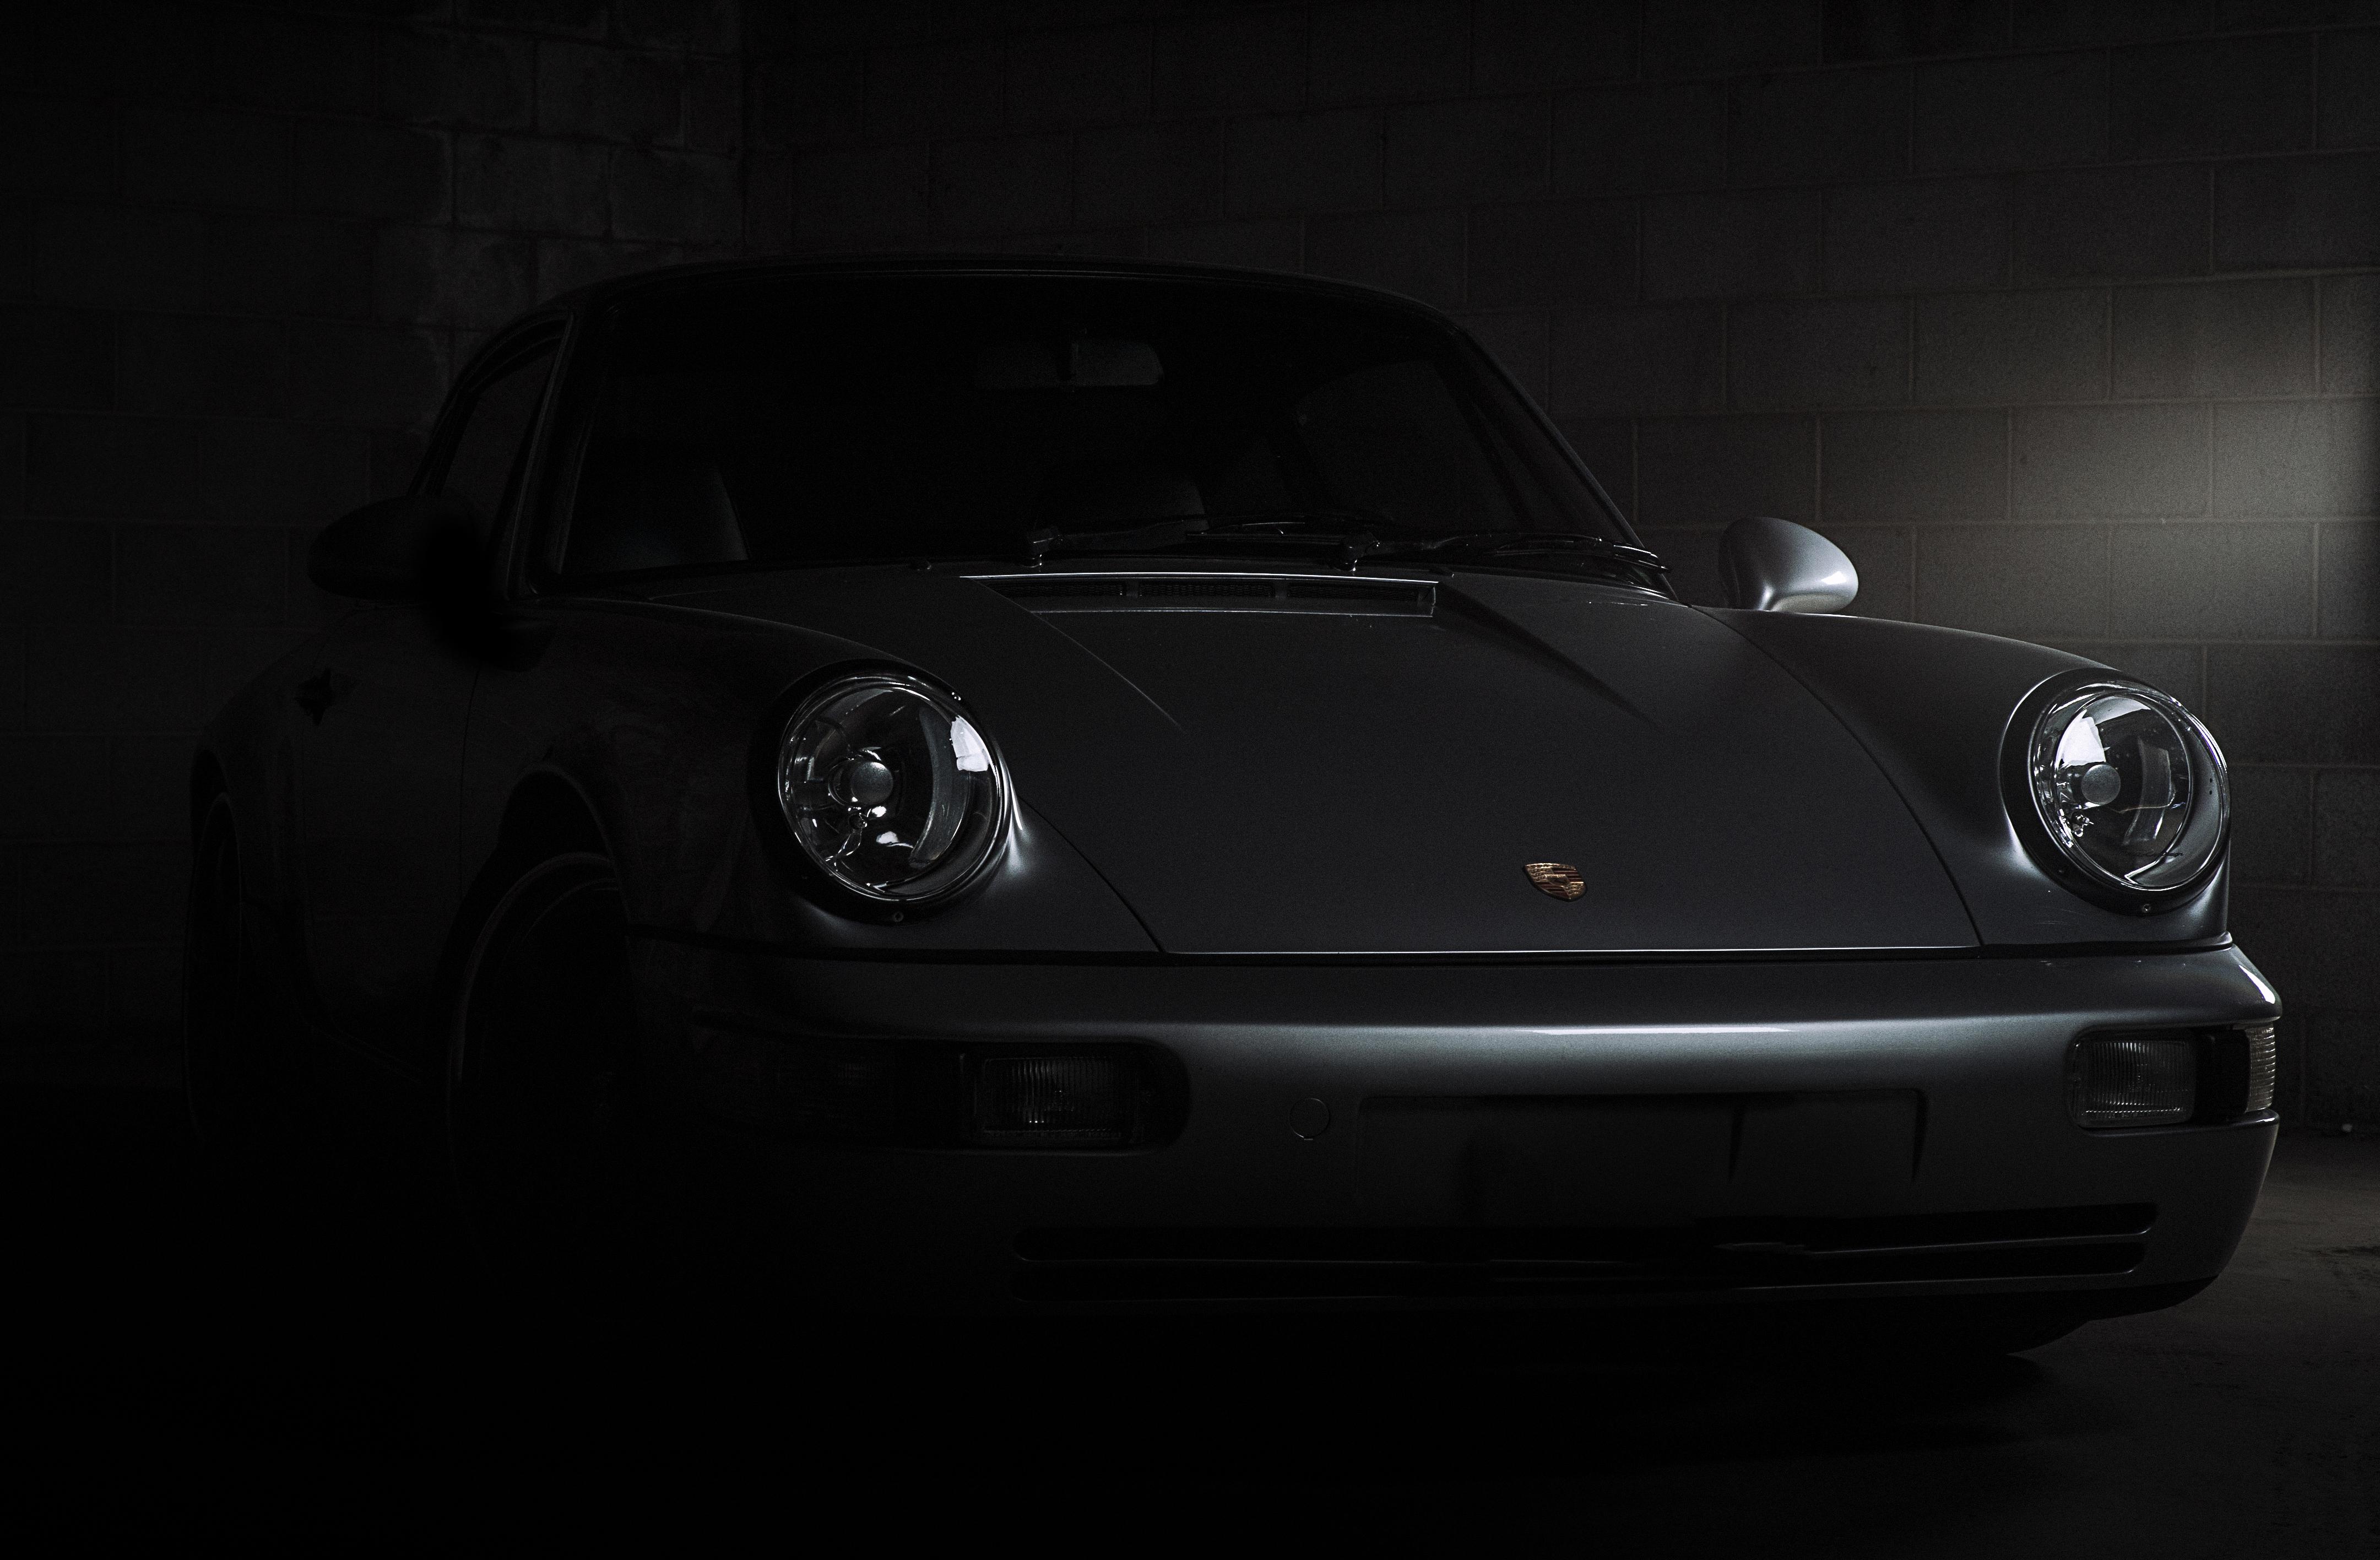 31 Porsche Carrera Wallpapers On Wallpapersafari